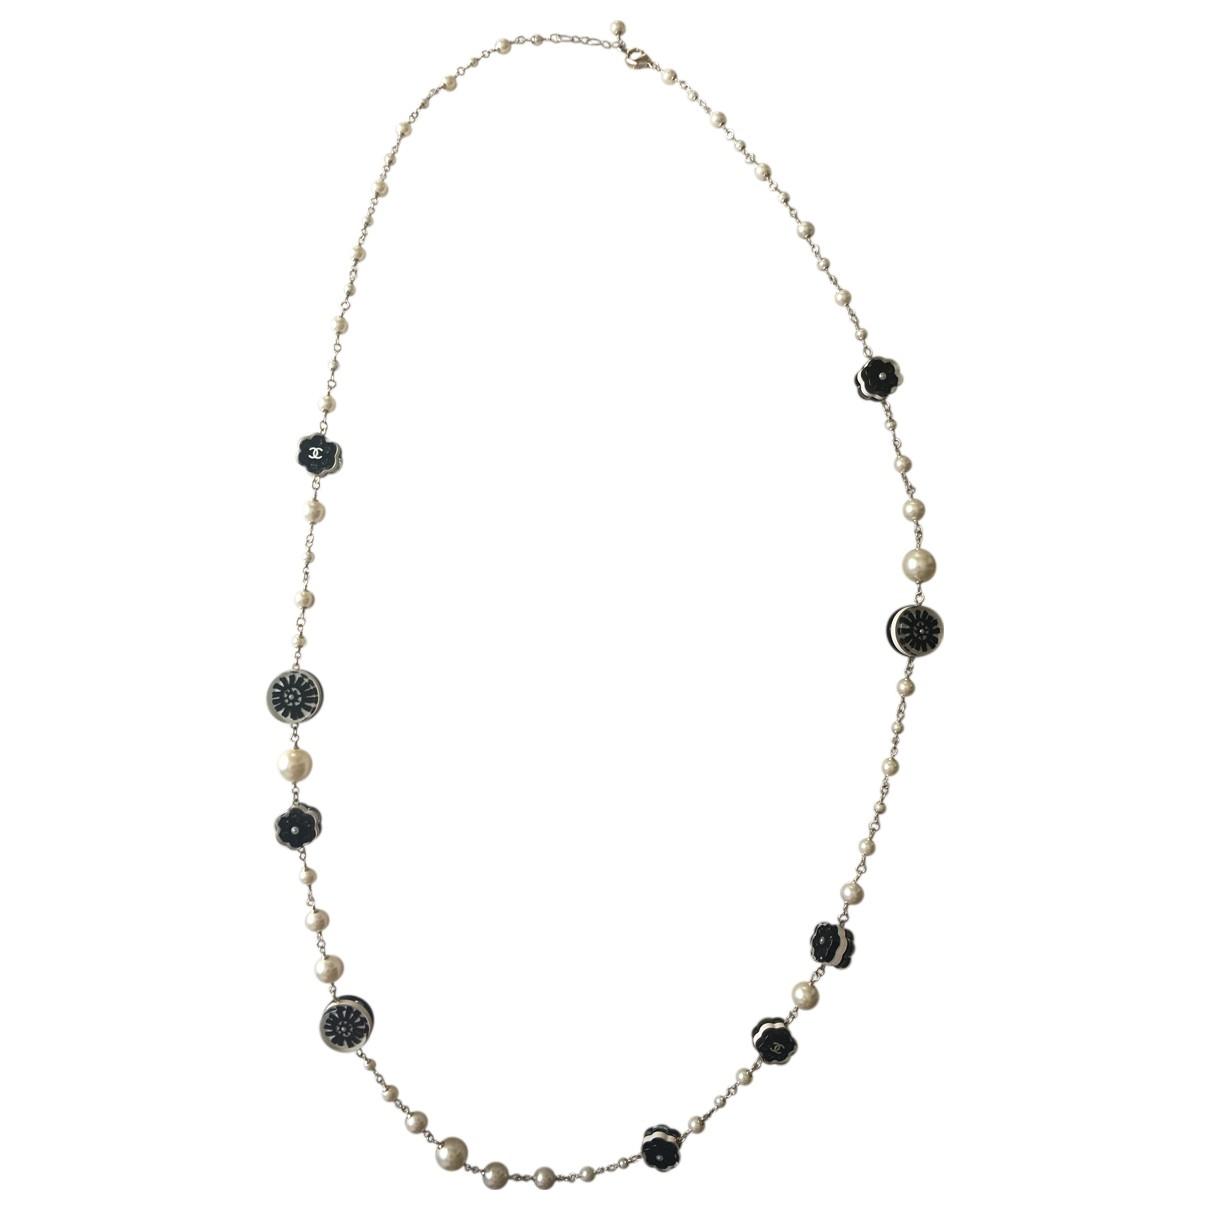 Chanel Camelia Halskette in  Weiss Perlen